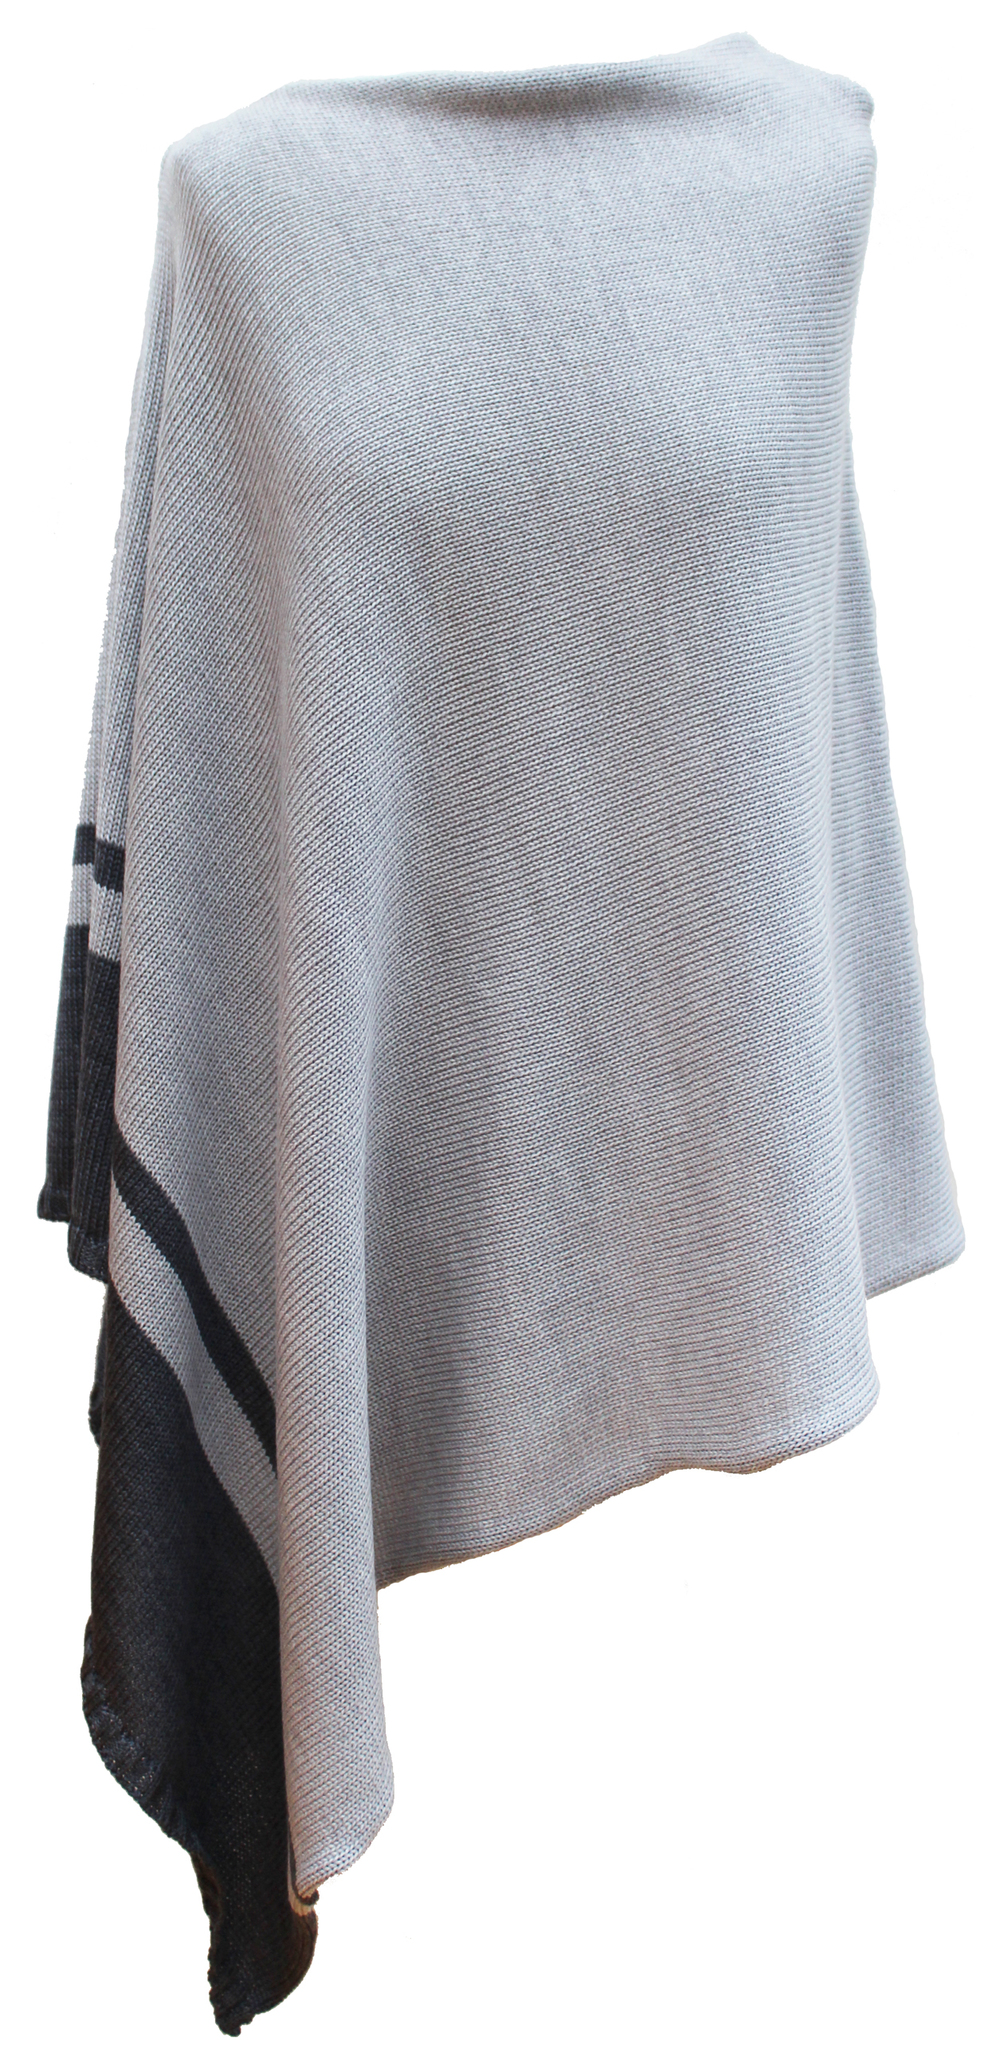 bespoke ladies merino wool knitted poncho